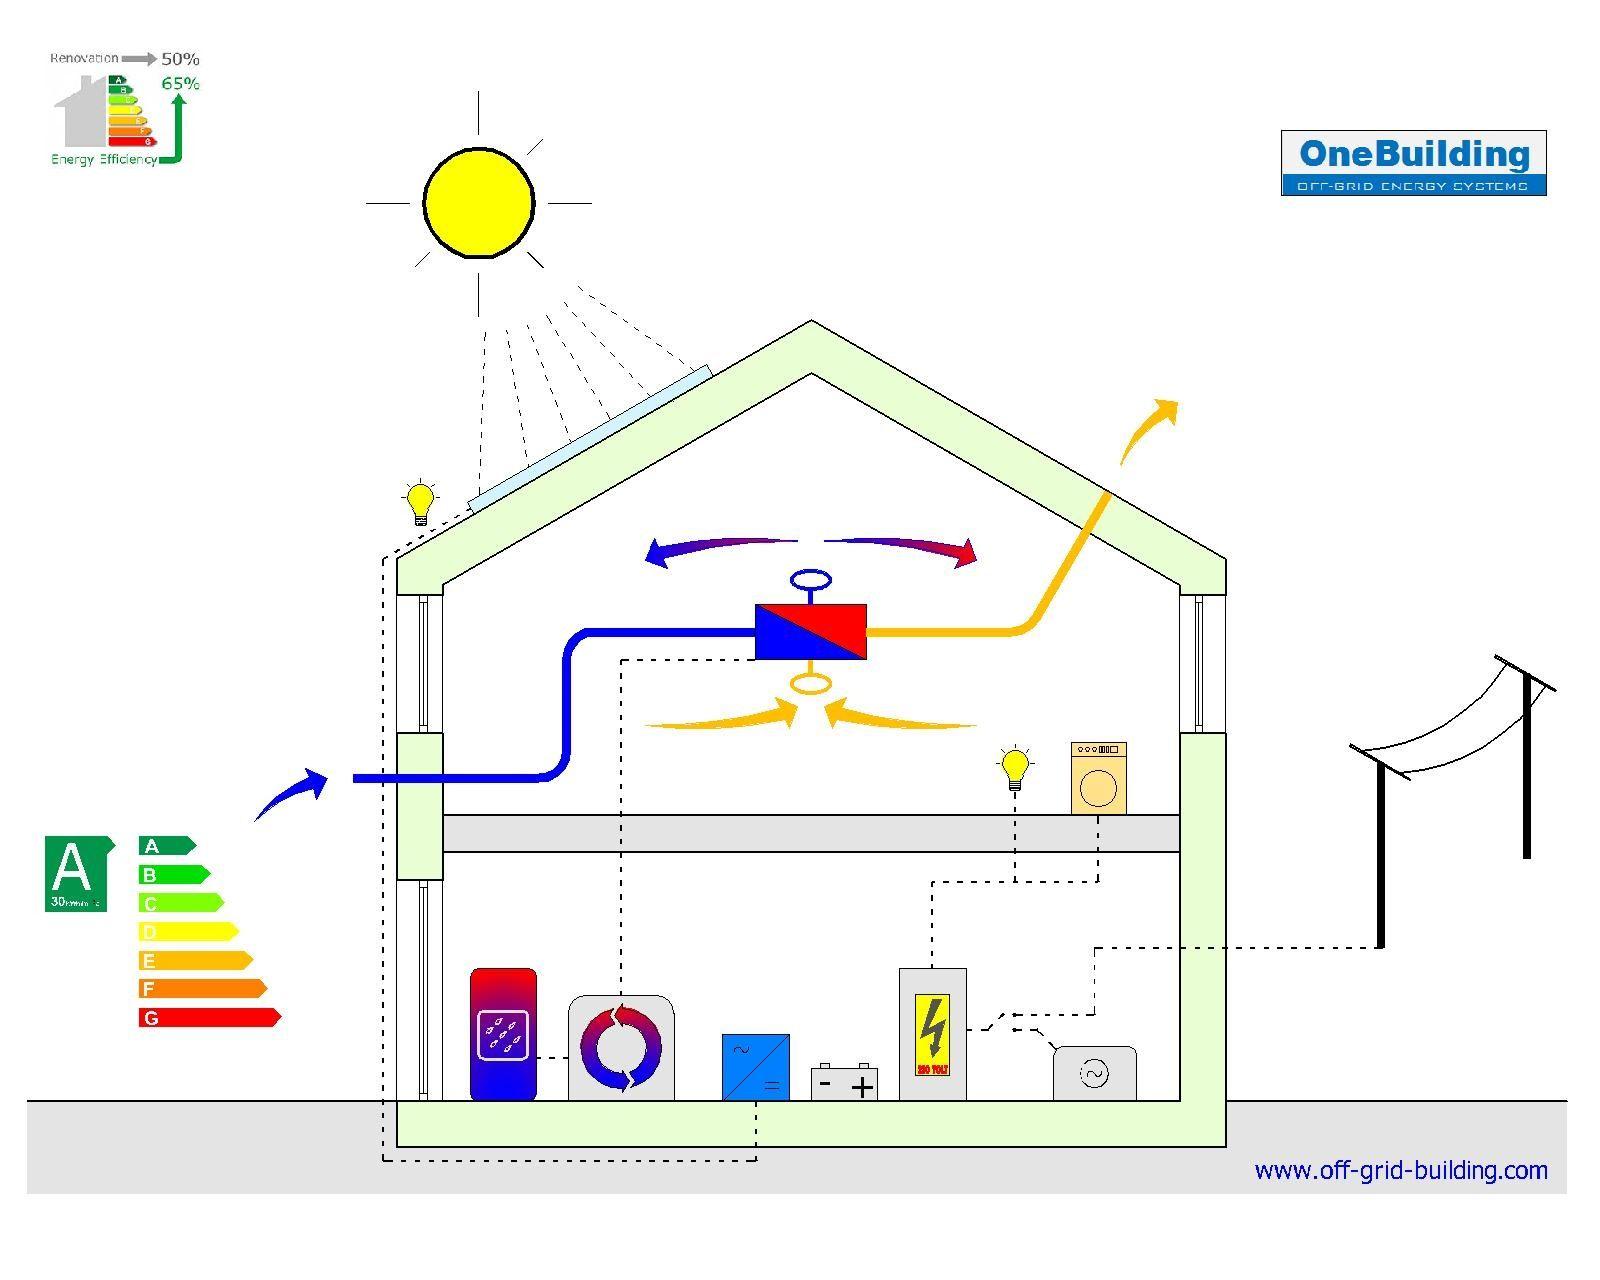 Solar Farm design scheme of an energy-efficient (class A